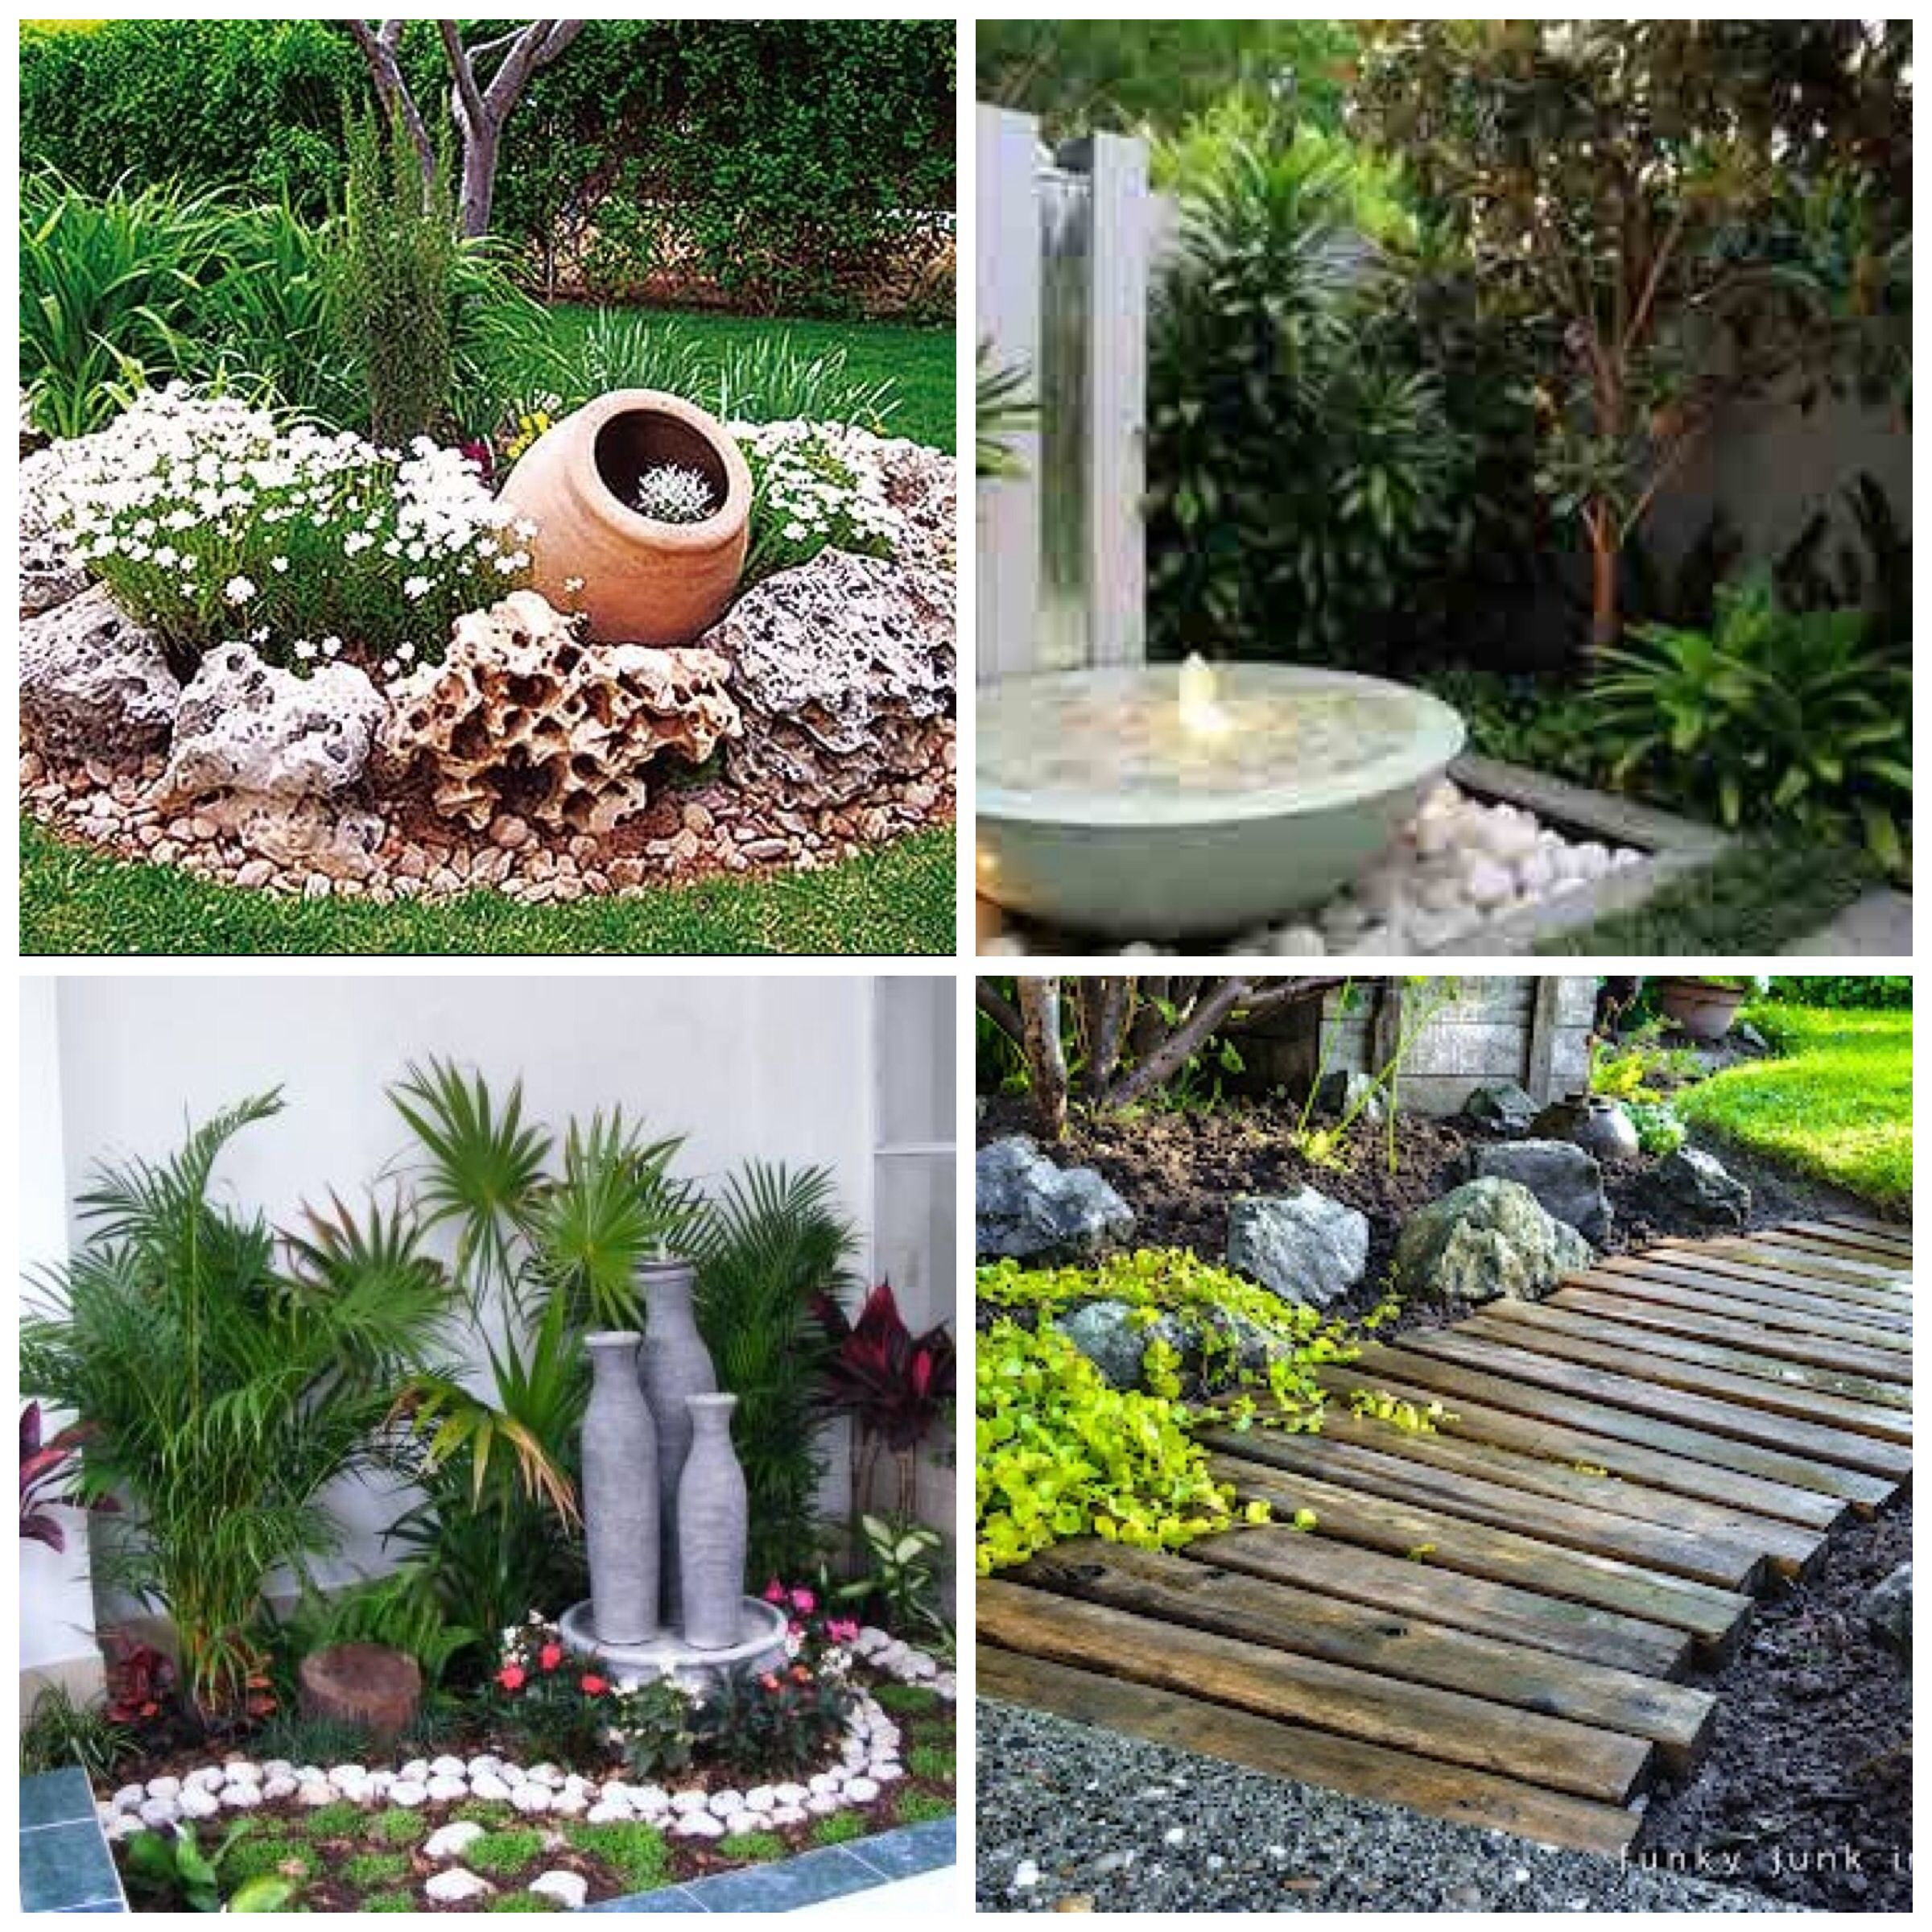 Dise o de jardines casa y jardiner a pinterest for Ideas jardin